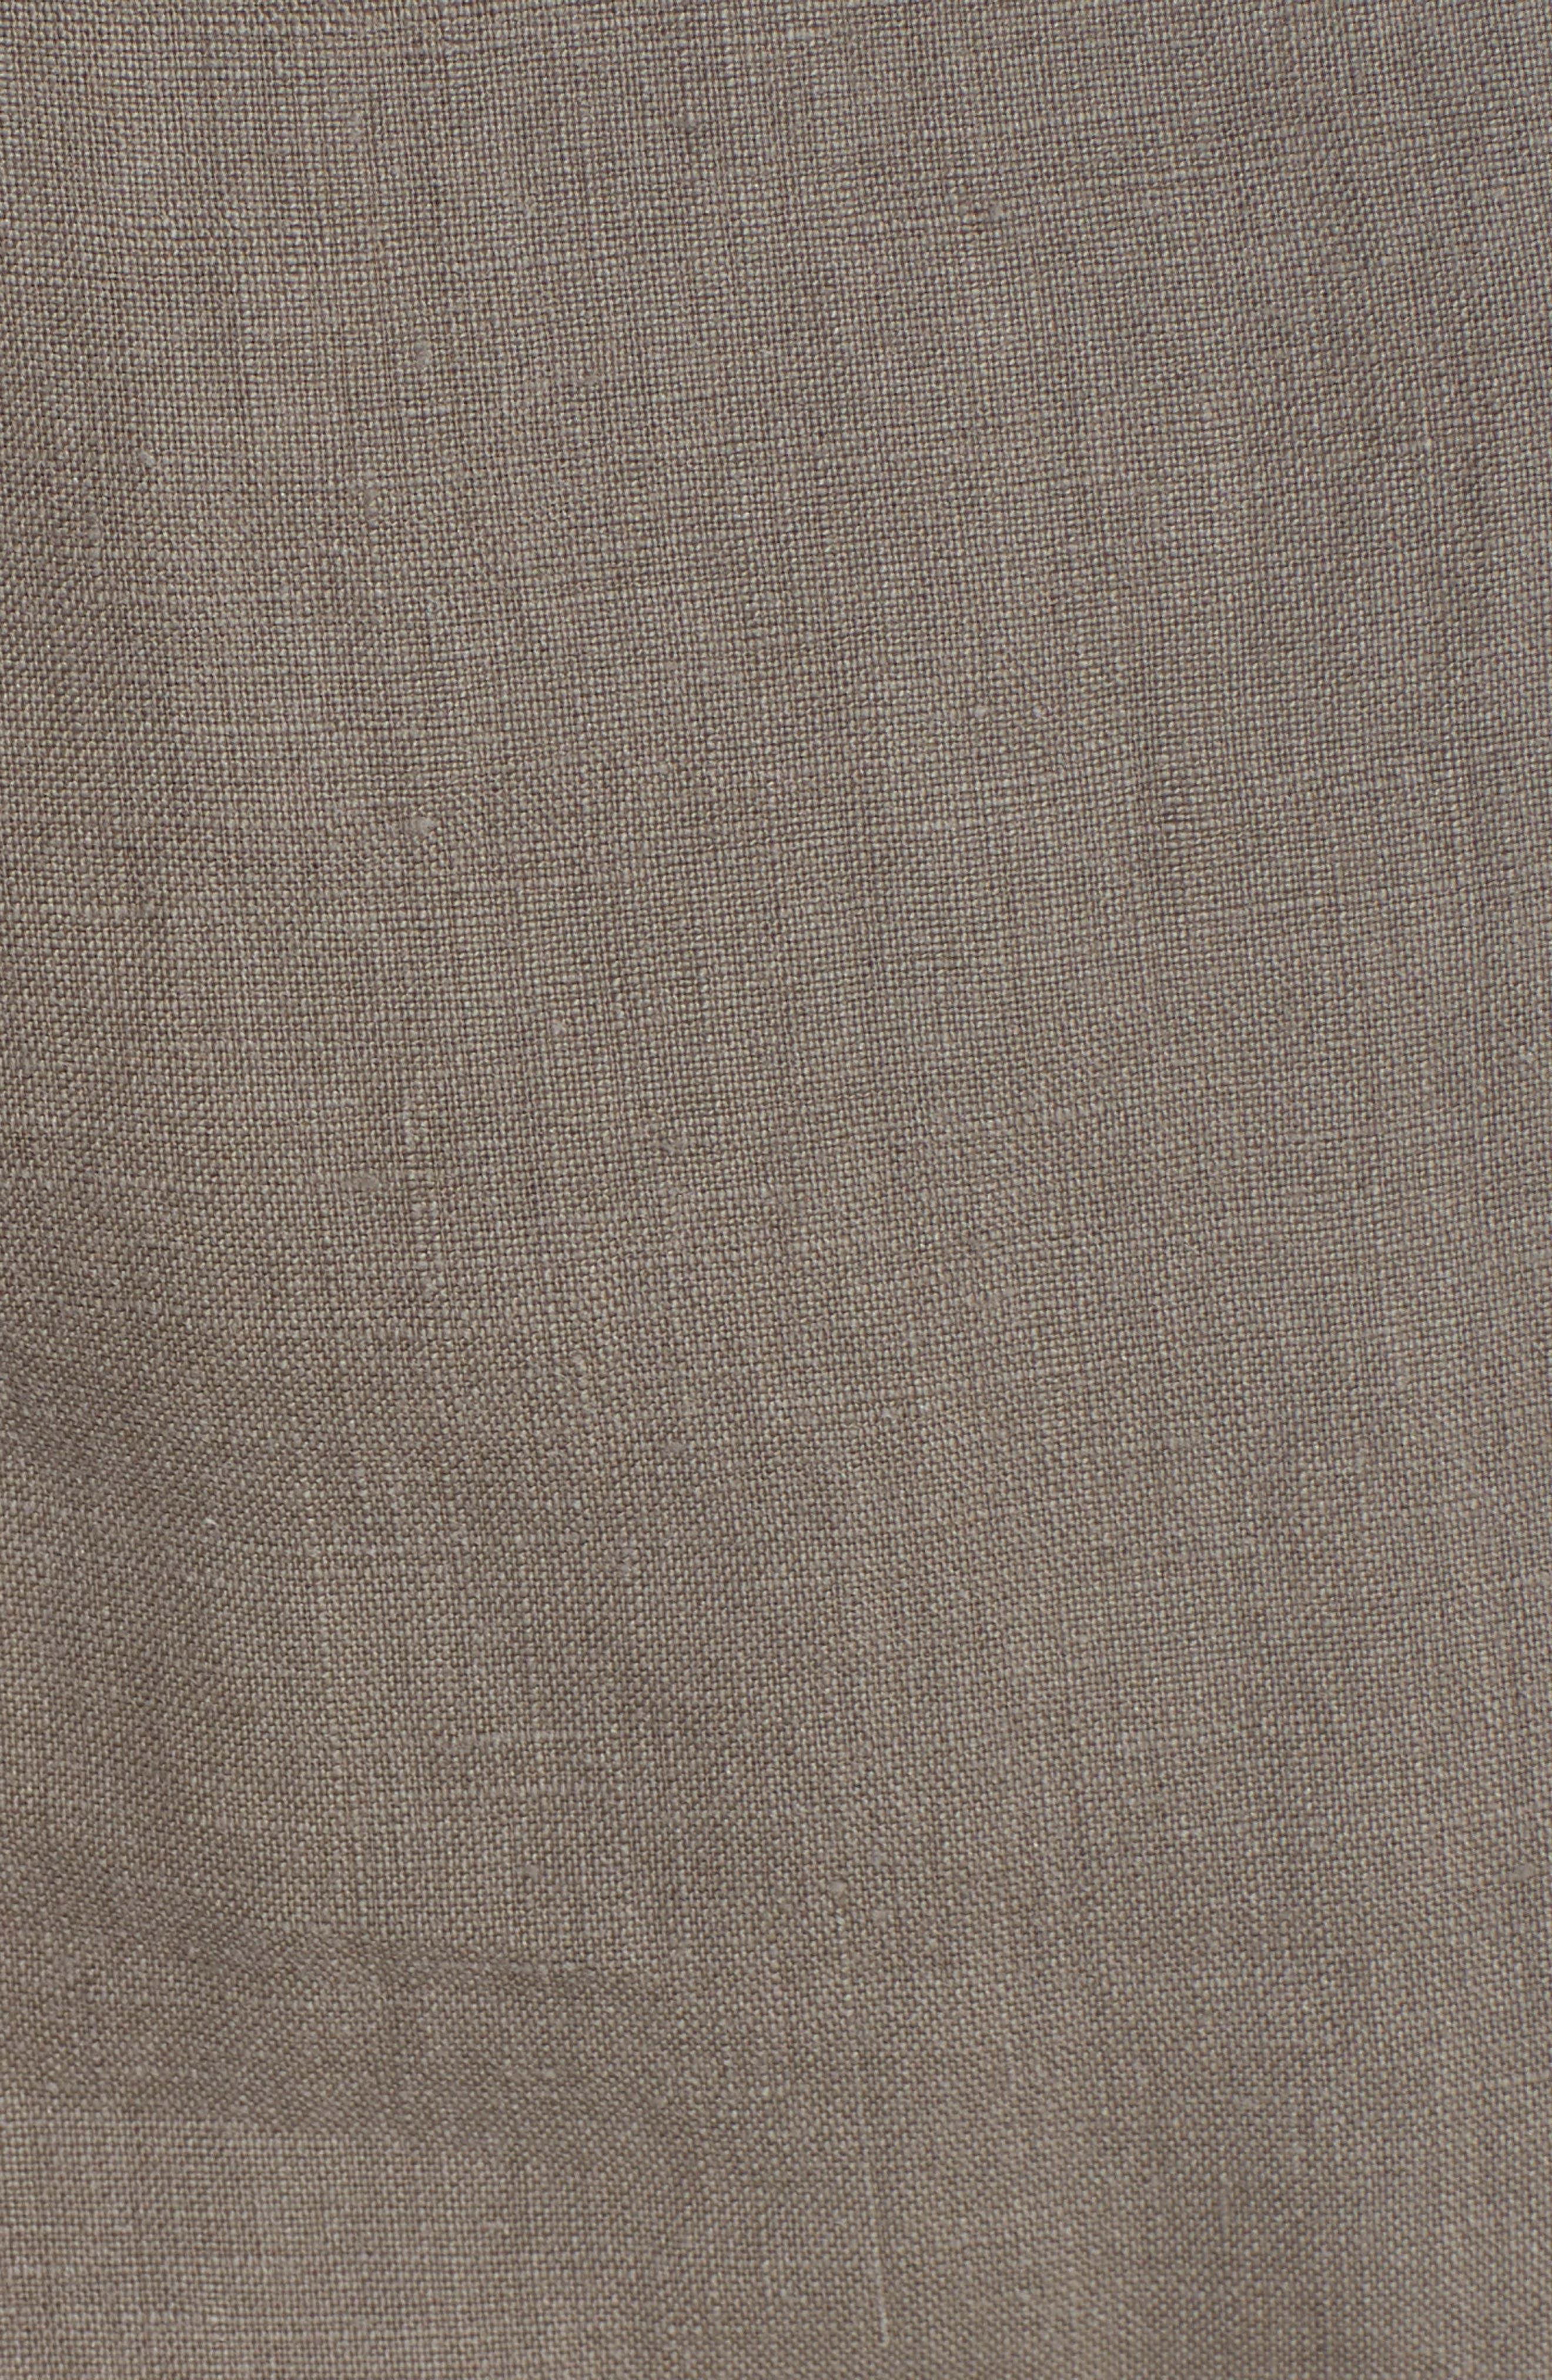 Quora Ruffle Linen Dress,                             Alternate thumbnail 10, color,